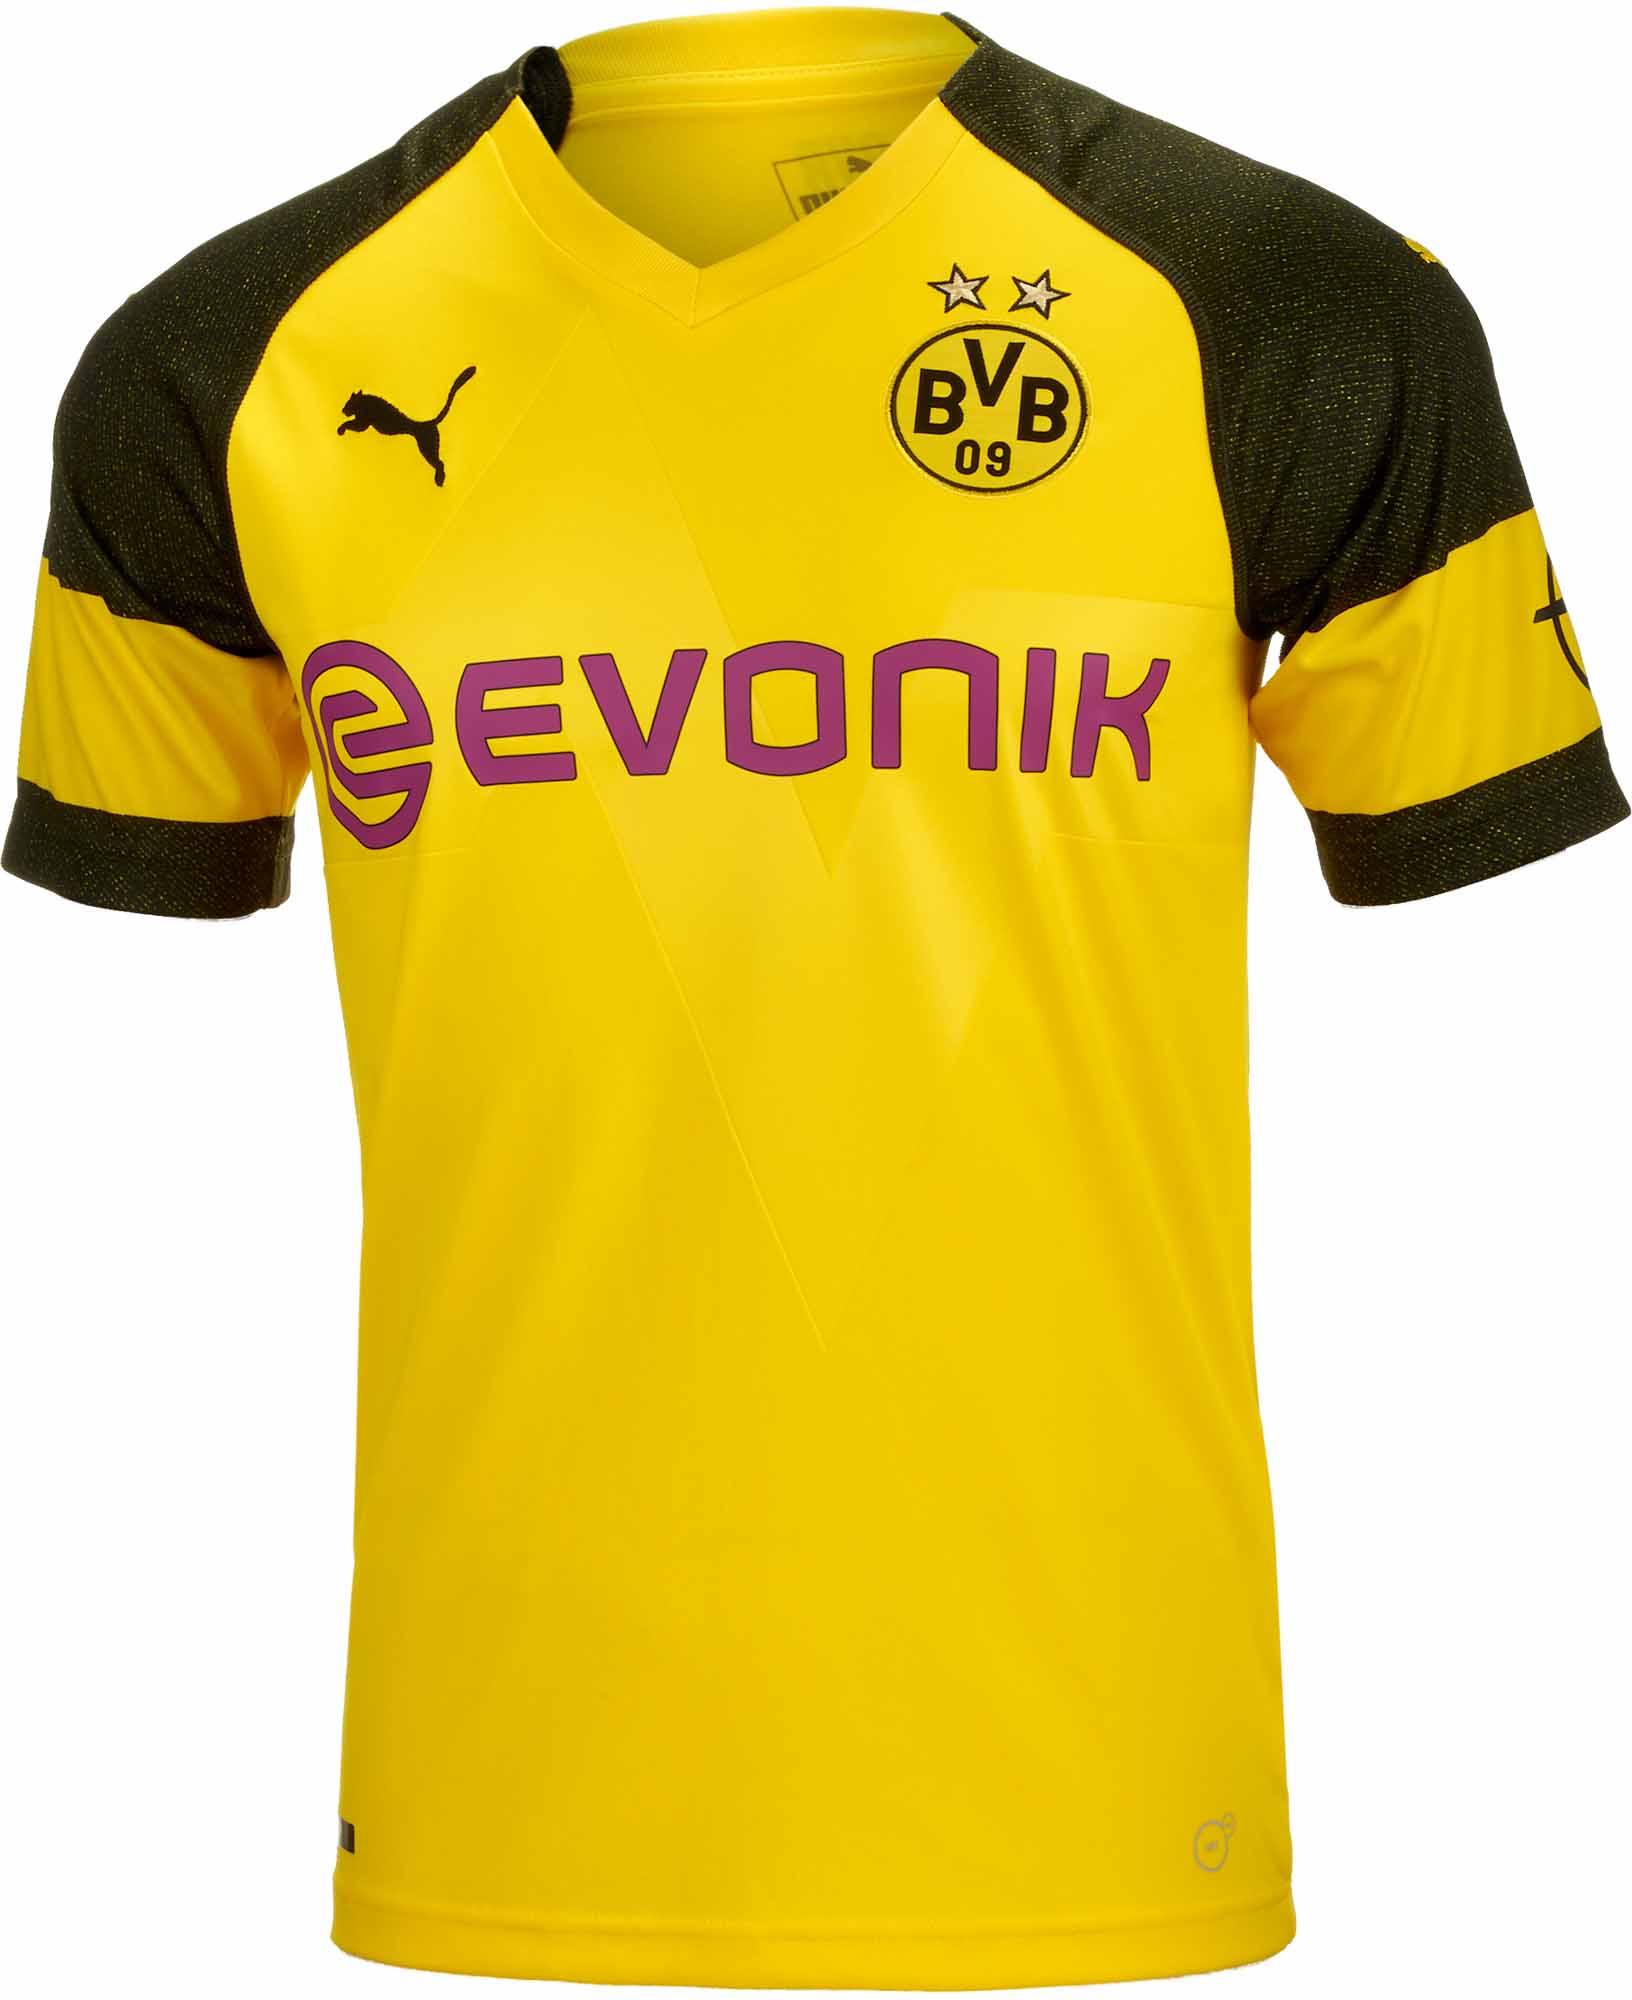 size 40 24d23 3cbf3 2018/19 Kids PUMA Borussia Dortmund Home Jersey - SoccerPro